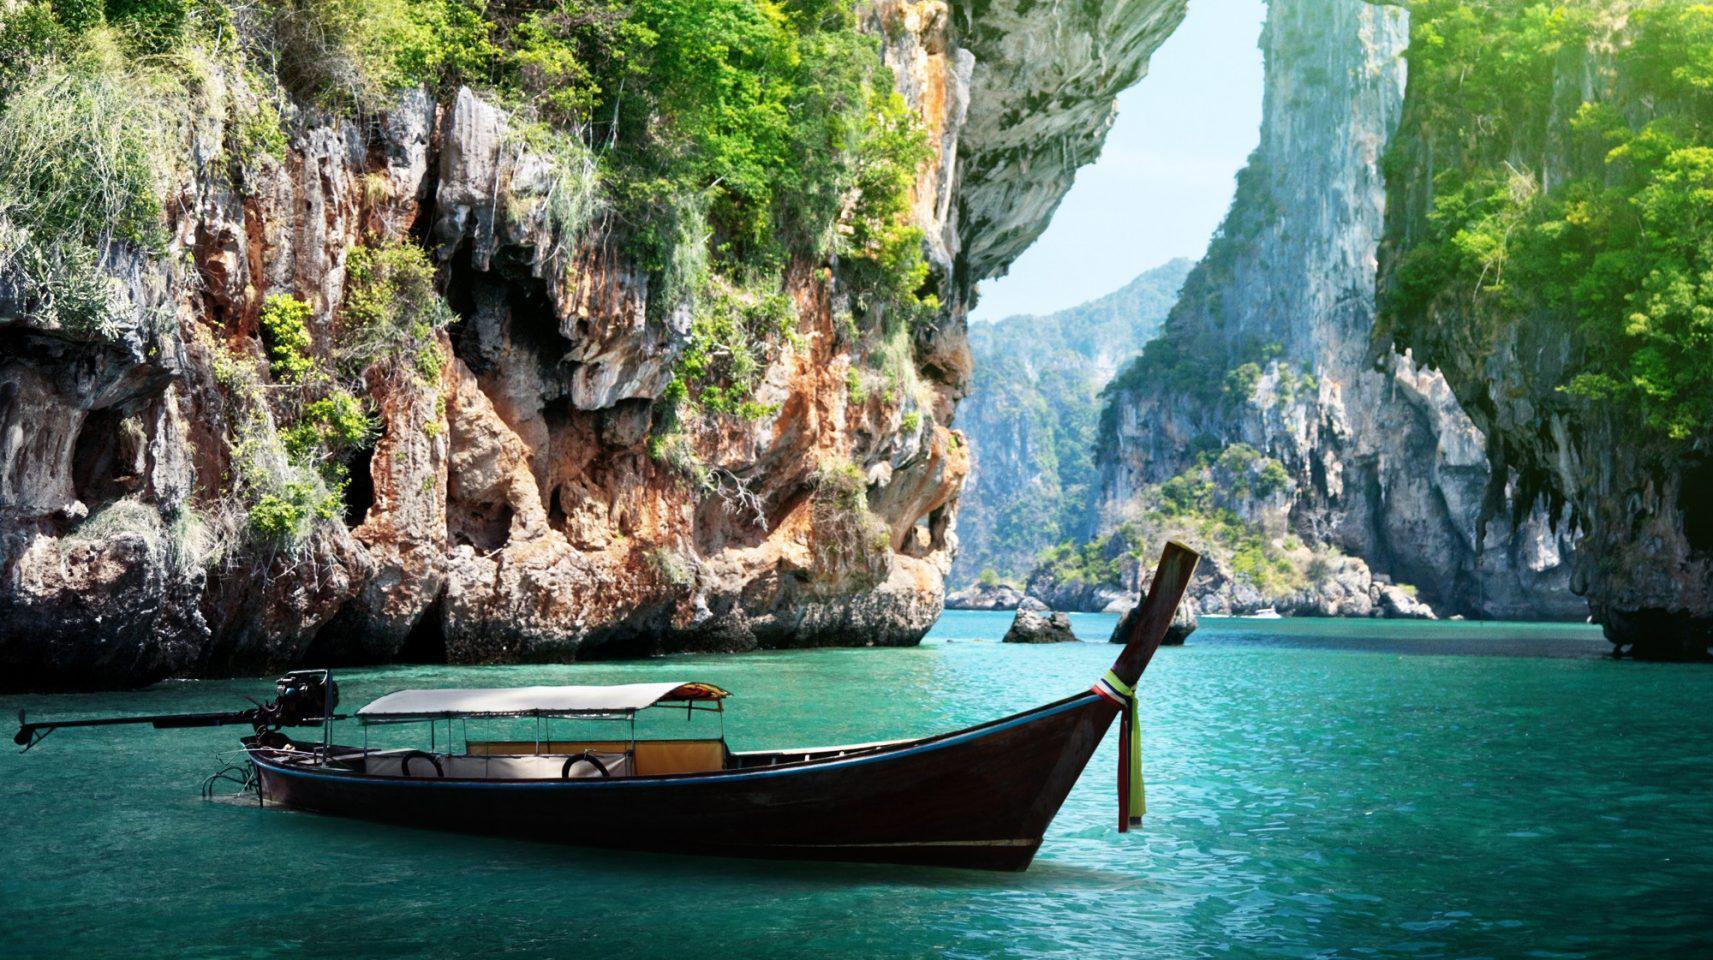 tailandi2 Μέρη που αξίζει να επισκεφτείς μέσα στο 2017 (μέρος β')